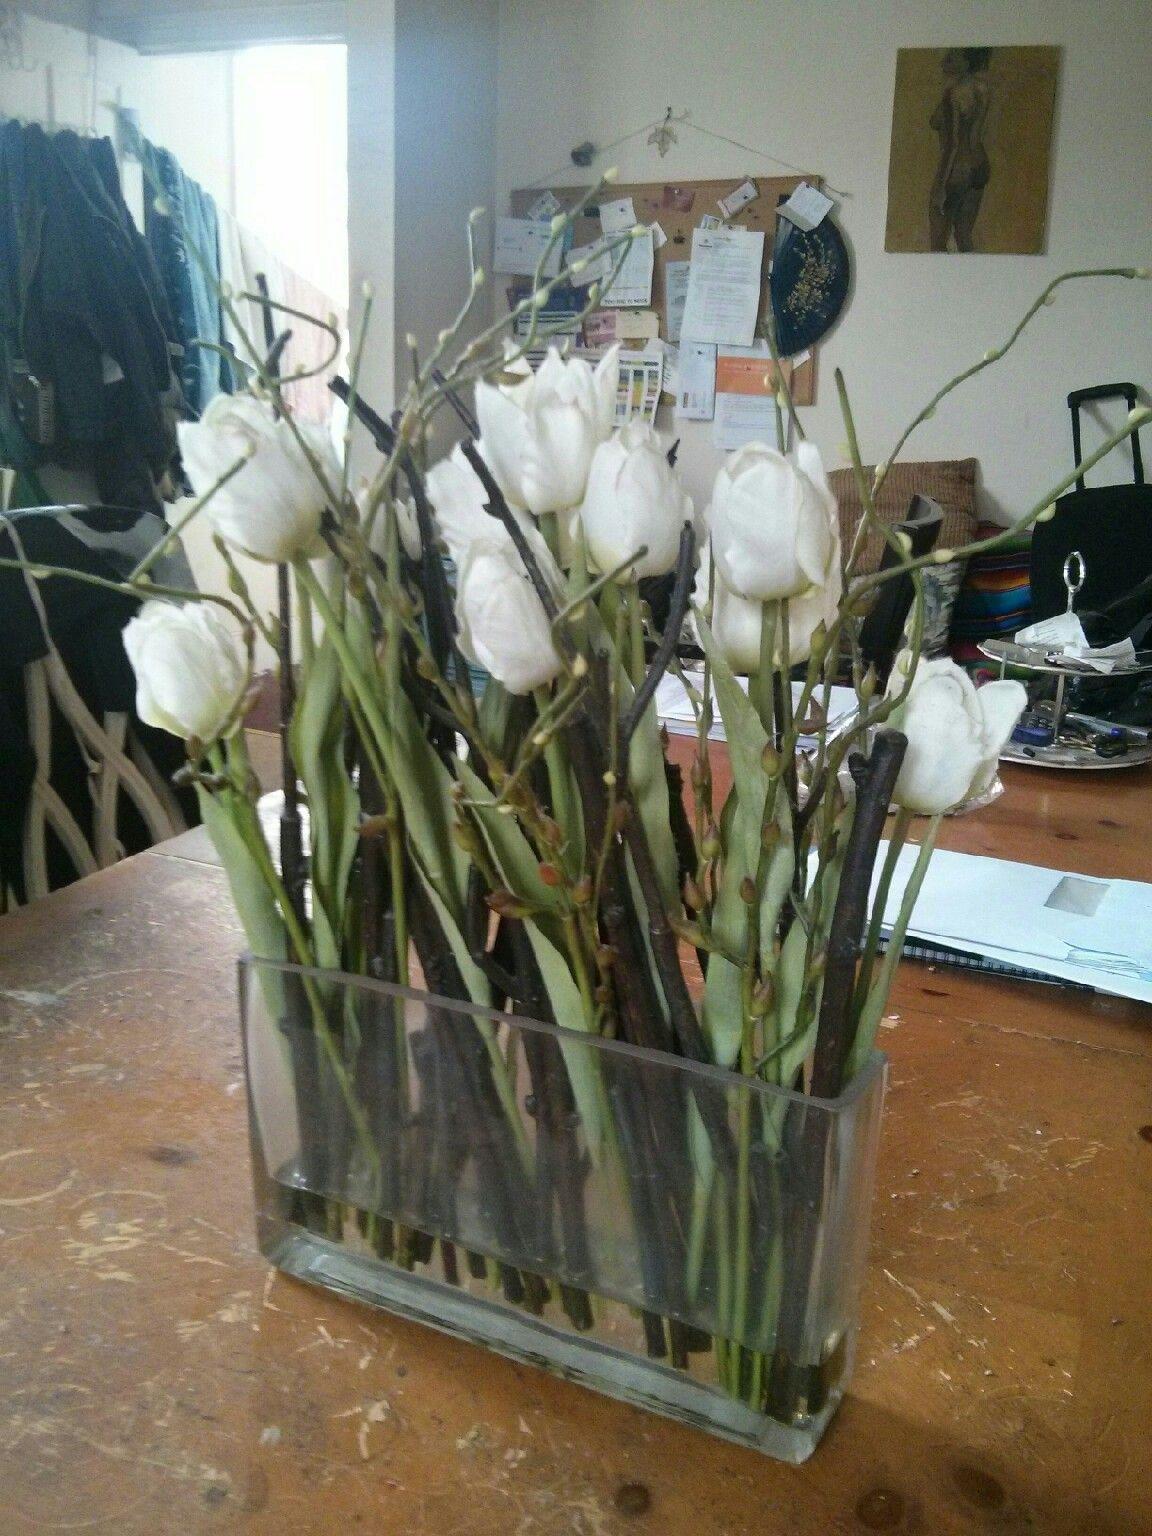 4x4 square glass vase of https en shpock com i vcdwhfigyyu1i0wh 2015 11 14t034438 for vase of tulips fake